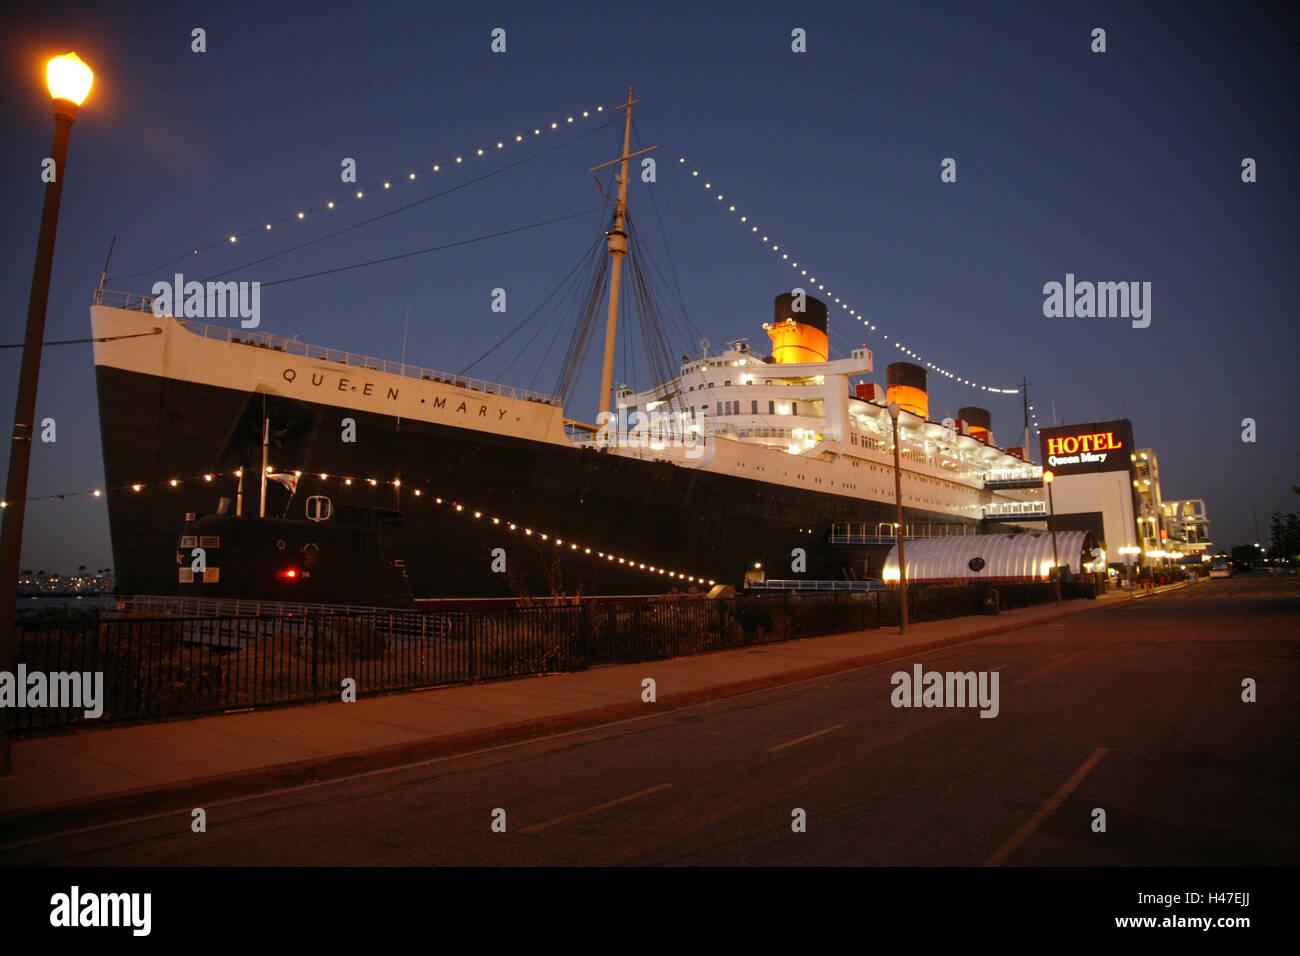 Usa California Los Angeles Long Beach Queen Mary Hotelschiff